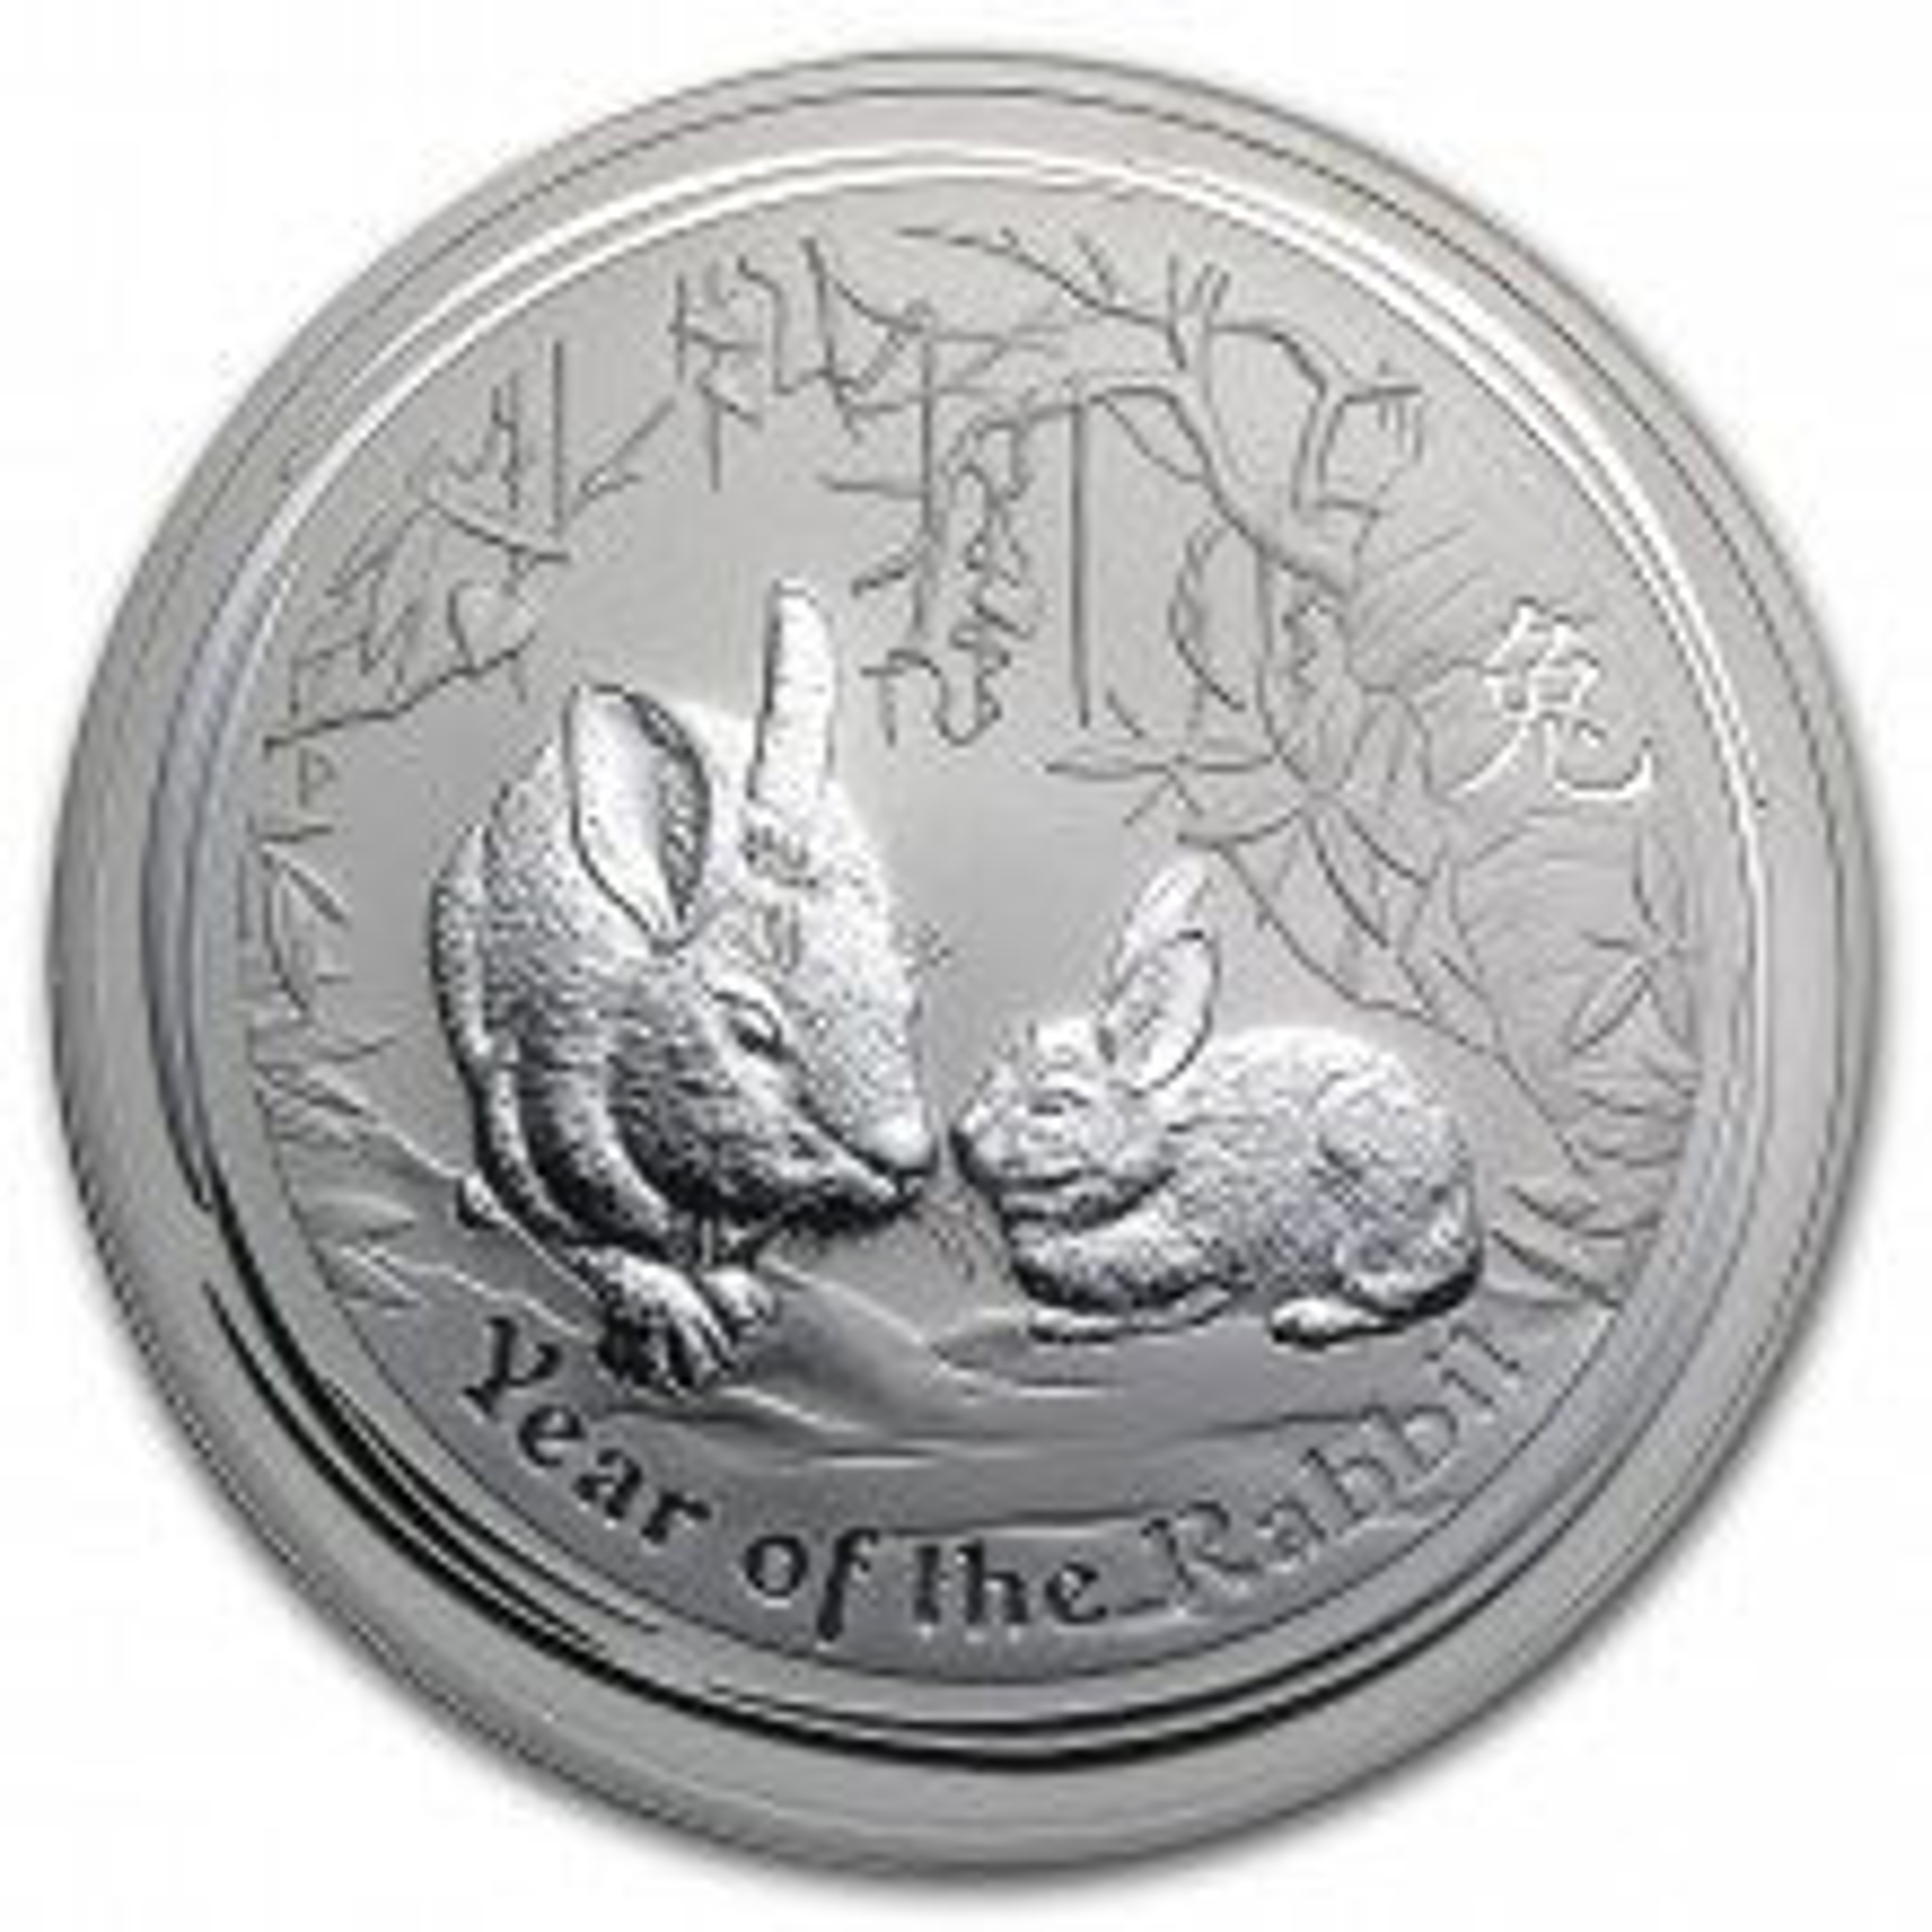 1 Kilo Lunar silver coin 2011